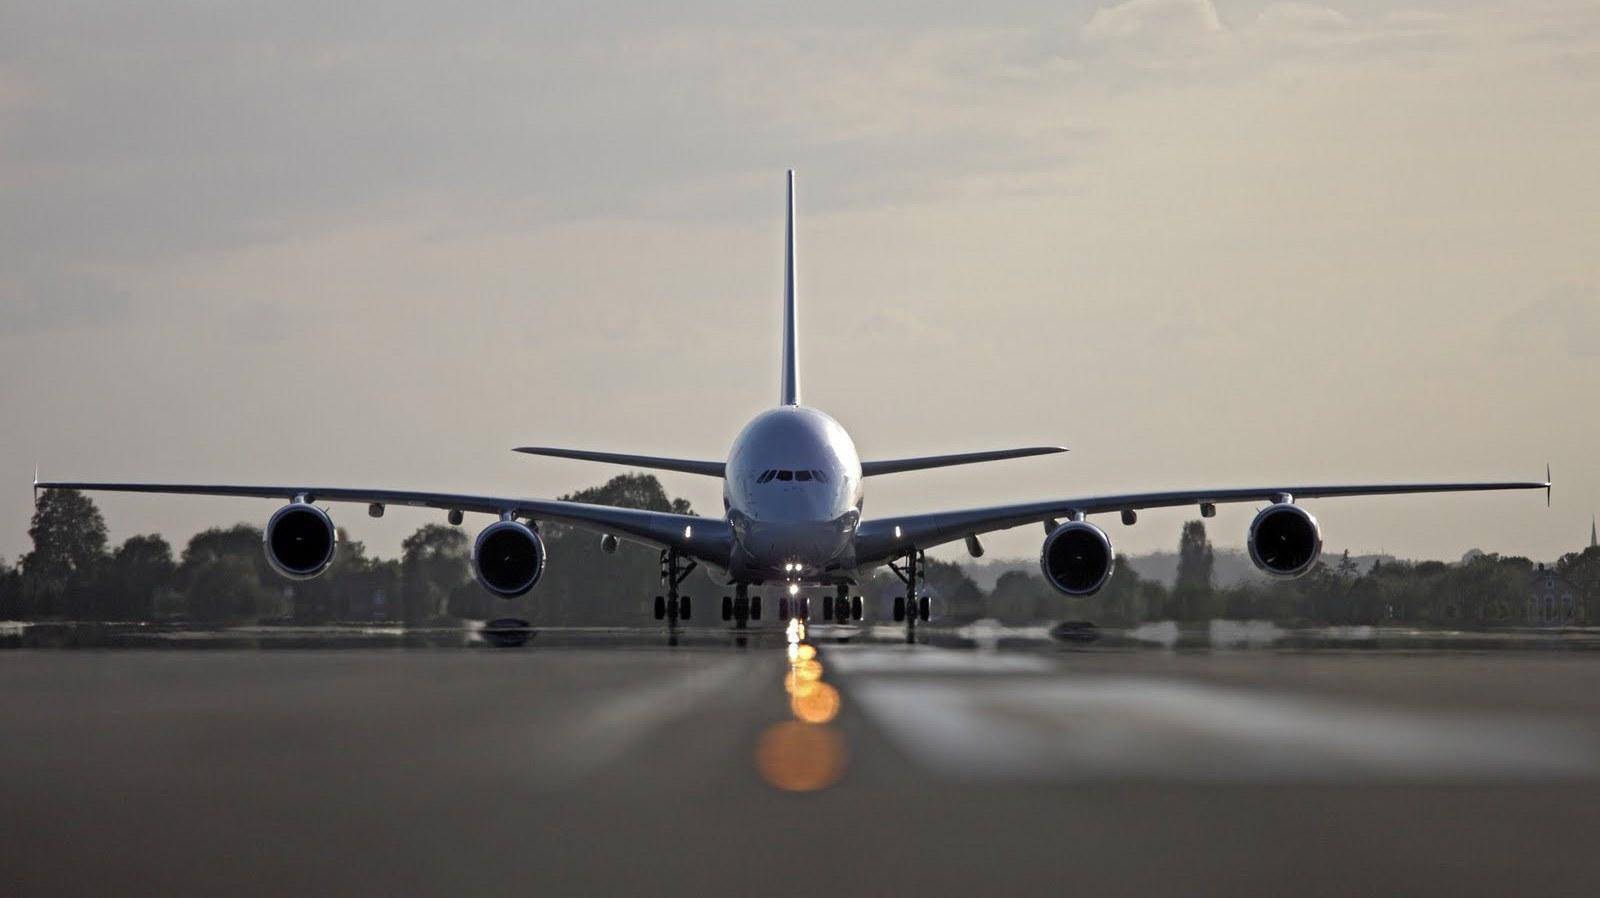 http://2.bp.blogspot.com/-VKyBI7U1XkQ/T7Sixo8l6NI/AAAAAAAAAro/6n9gUv5d8wU/s1600/air-france-airbus-a380-on-runway.JPG